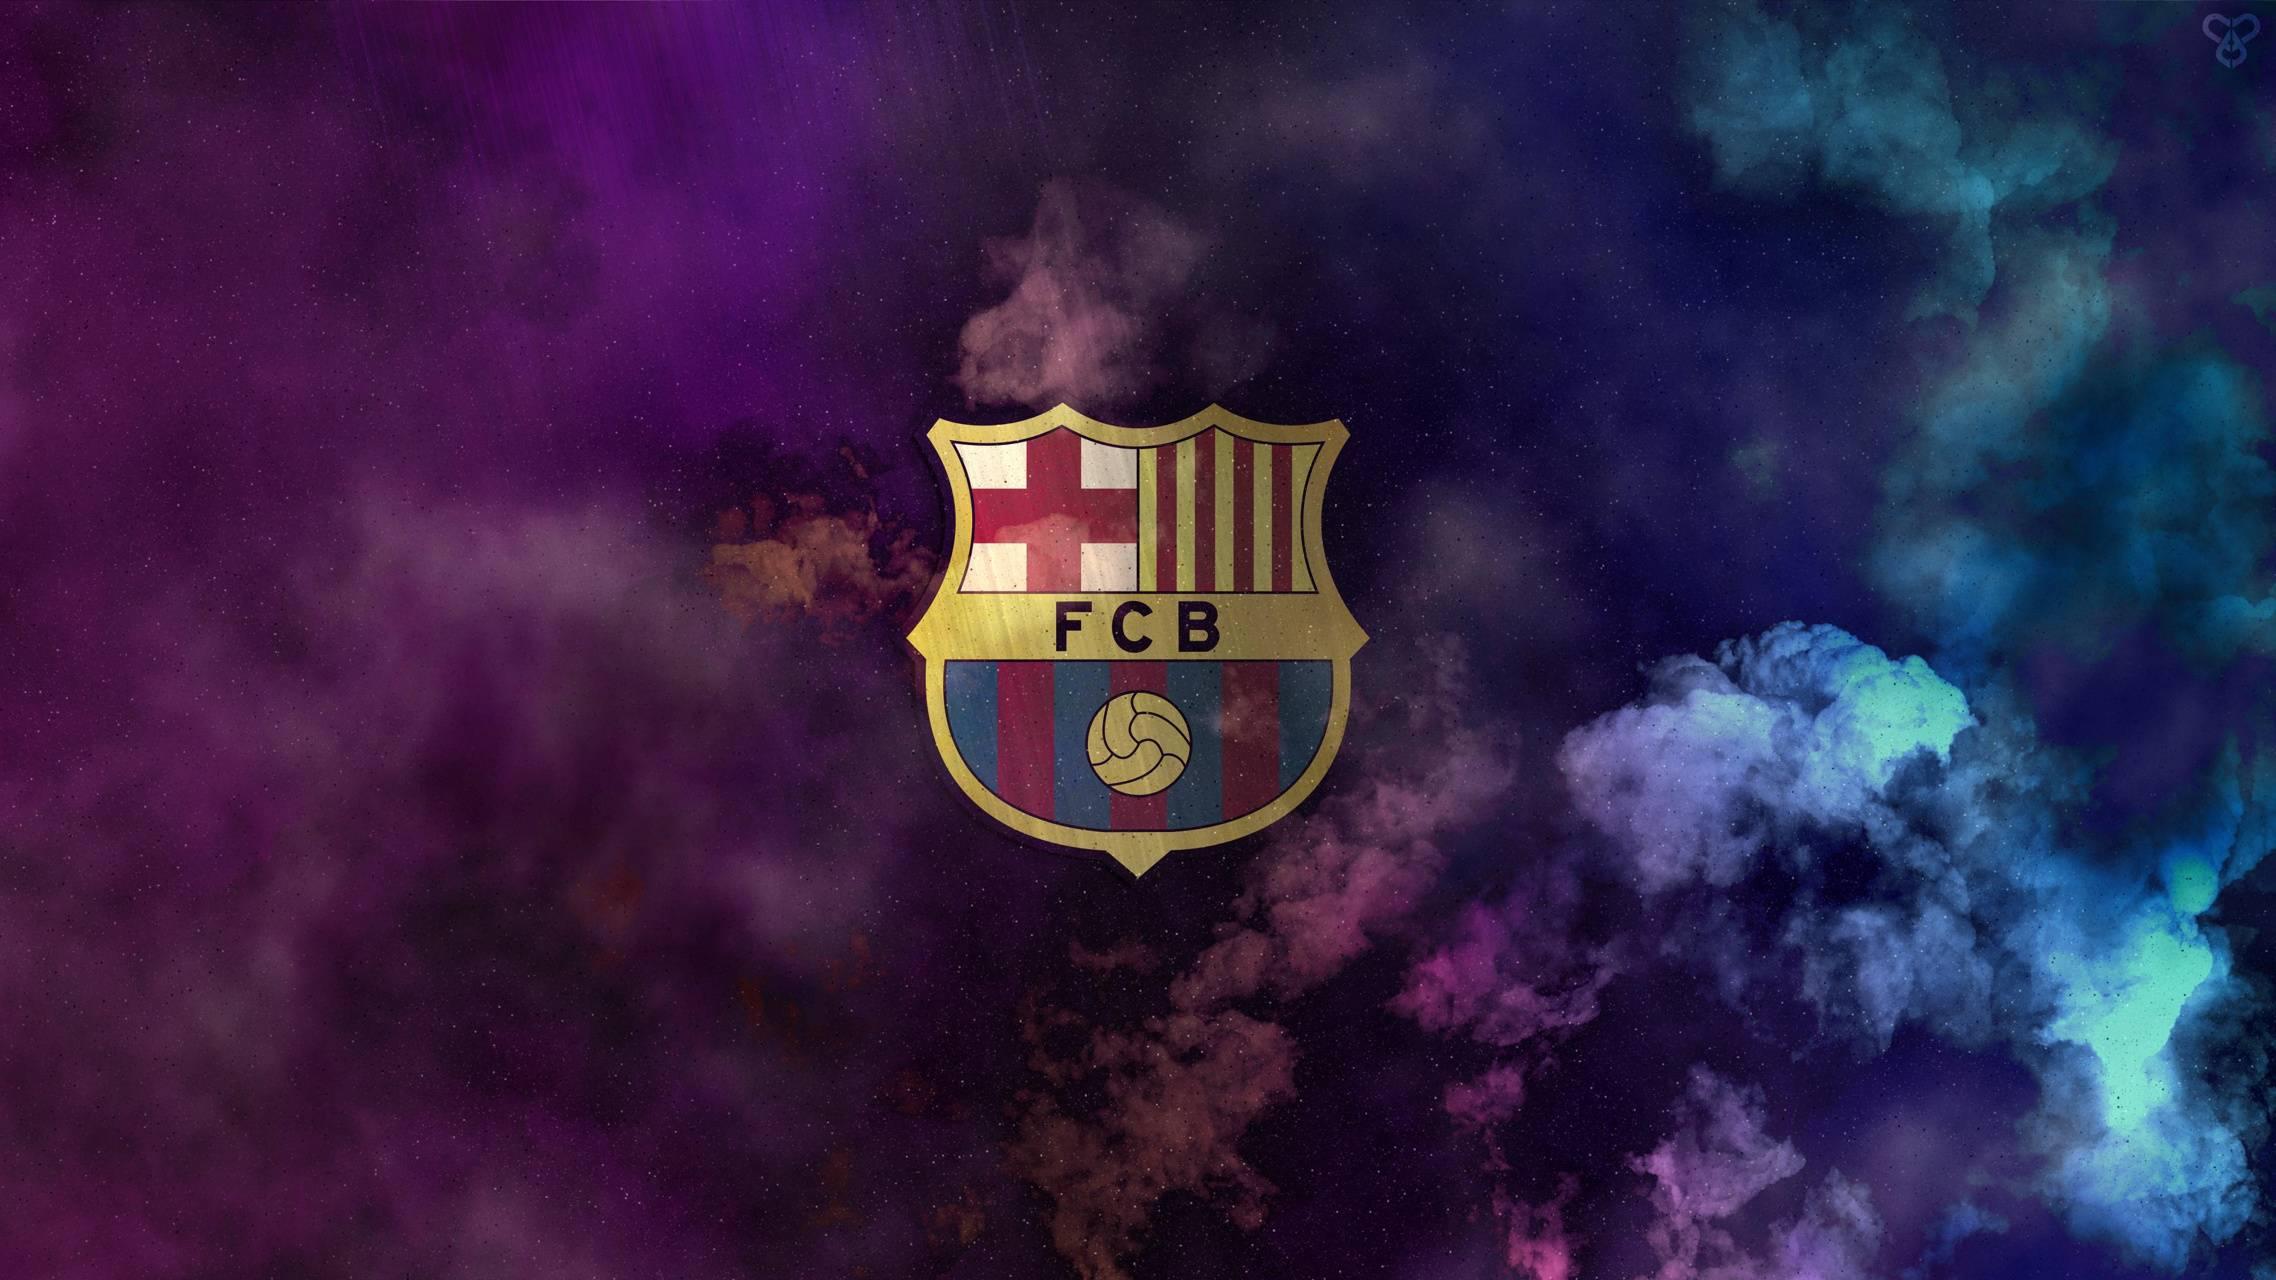 FC BARCELONA CLOUDS